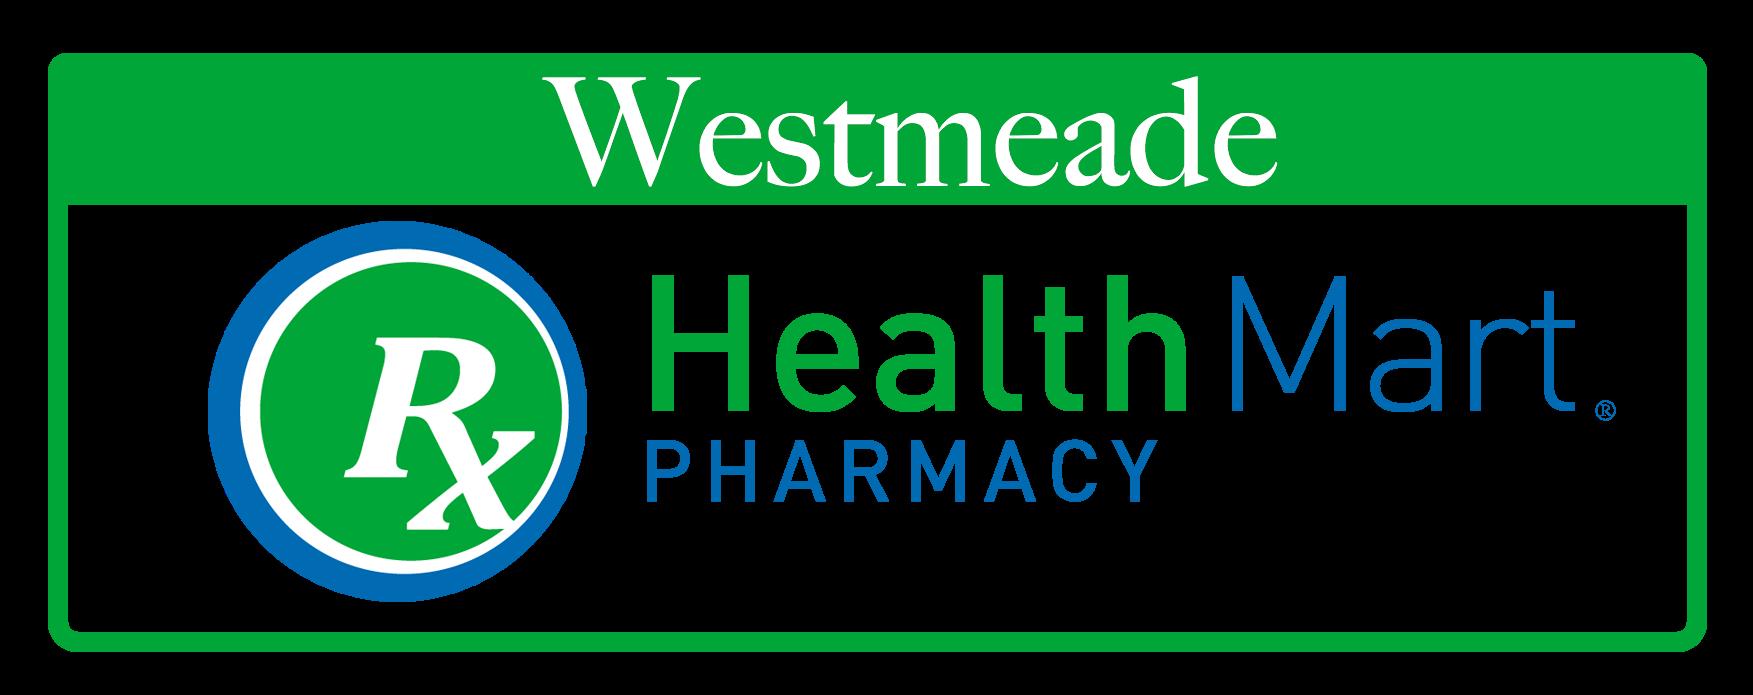 Westmeade Pharmacy